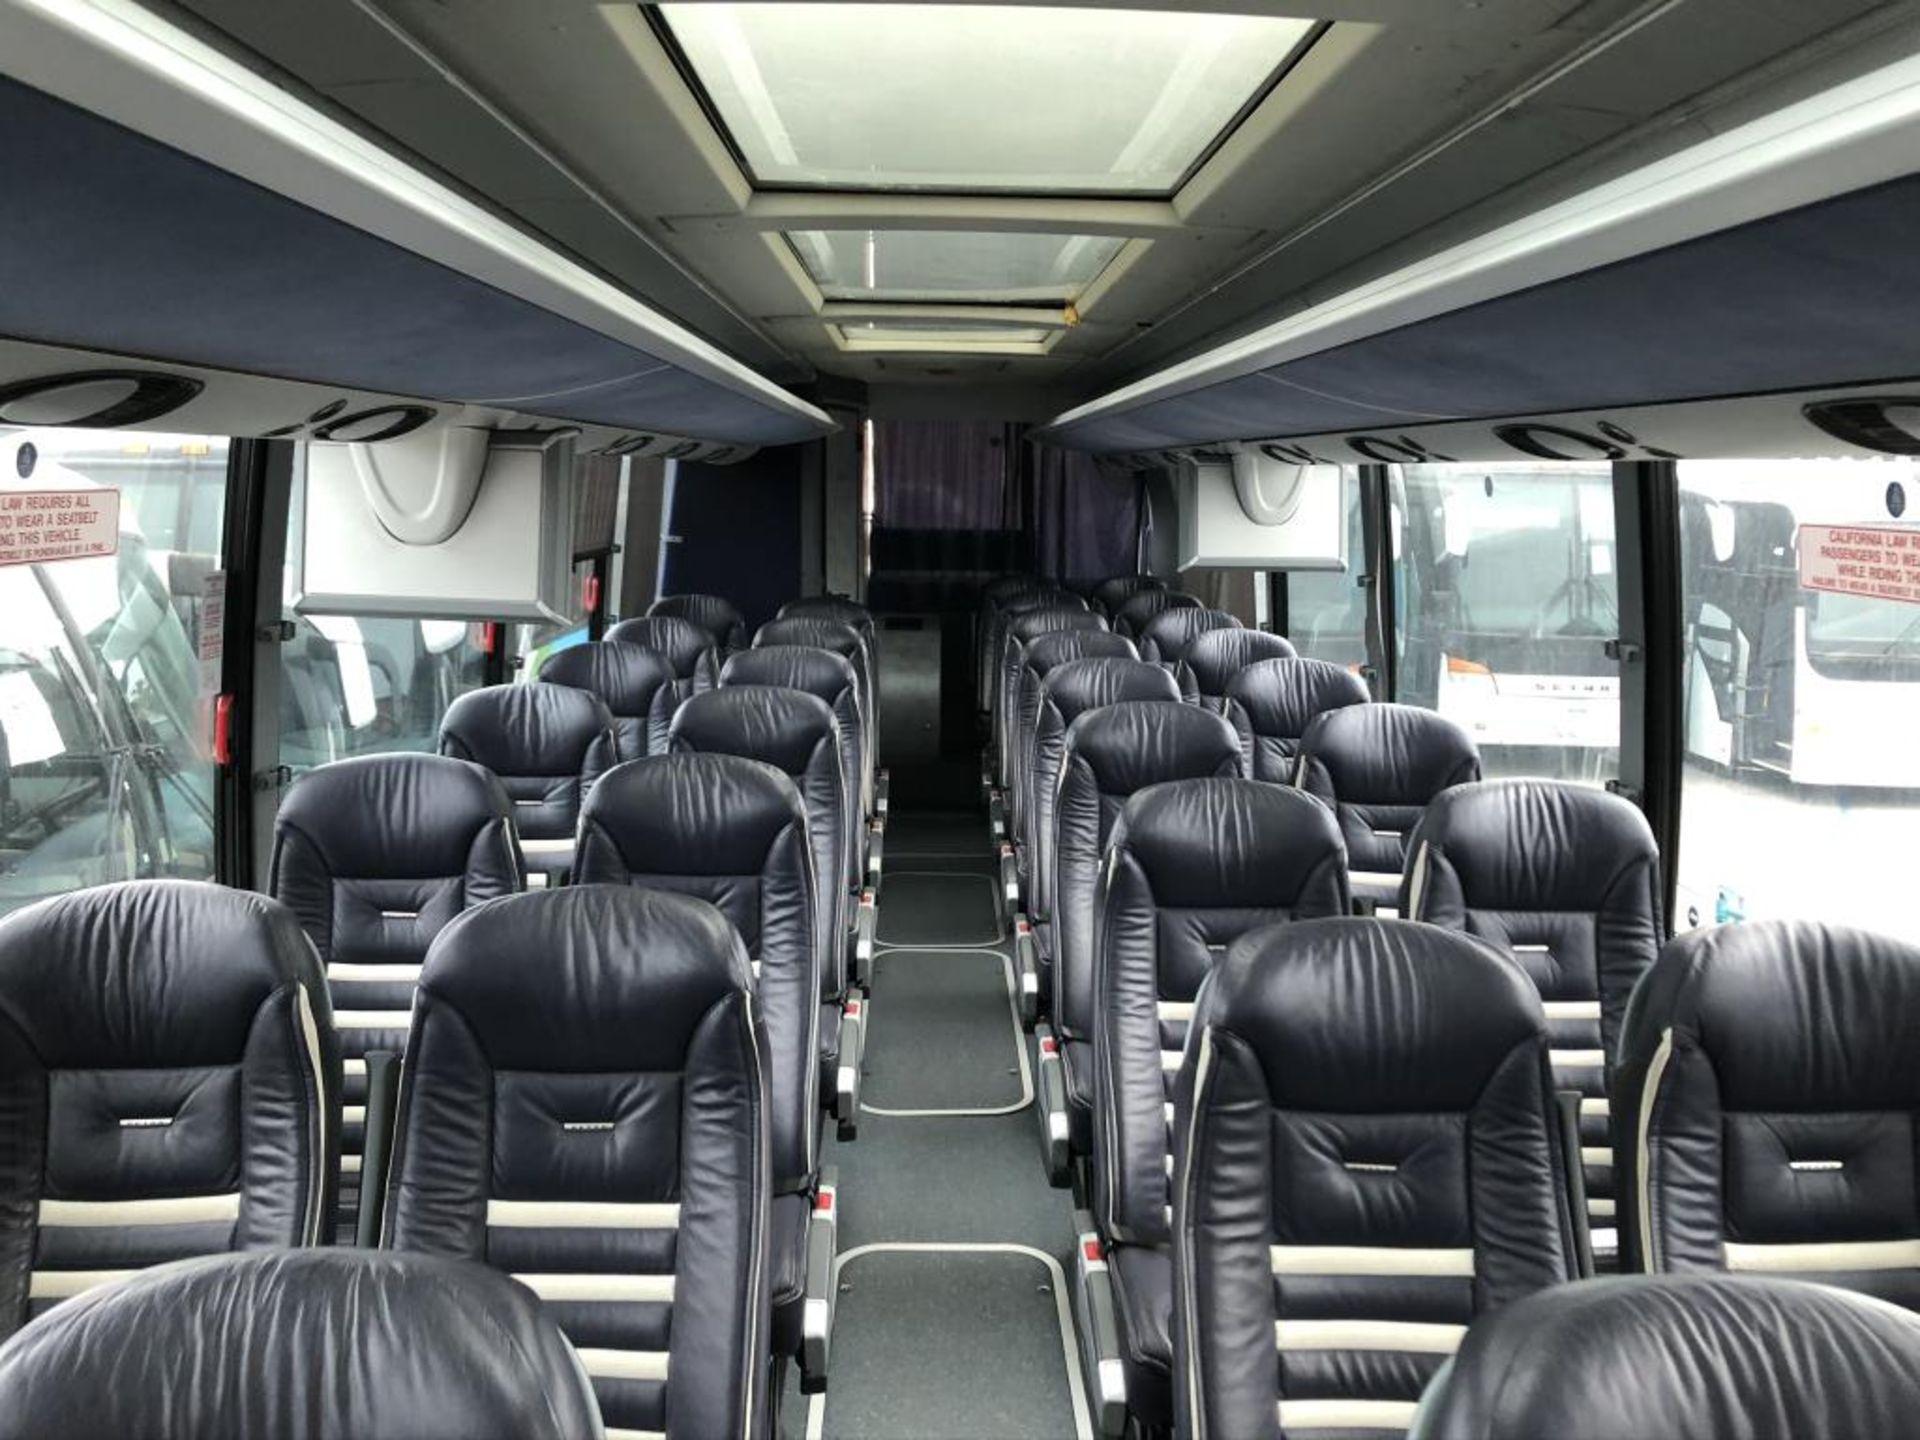 Motor Coach - Image 10 of 17